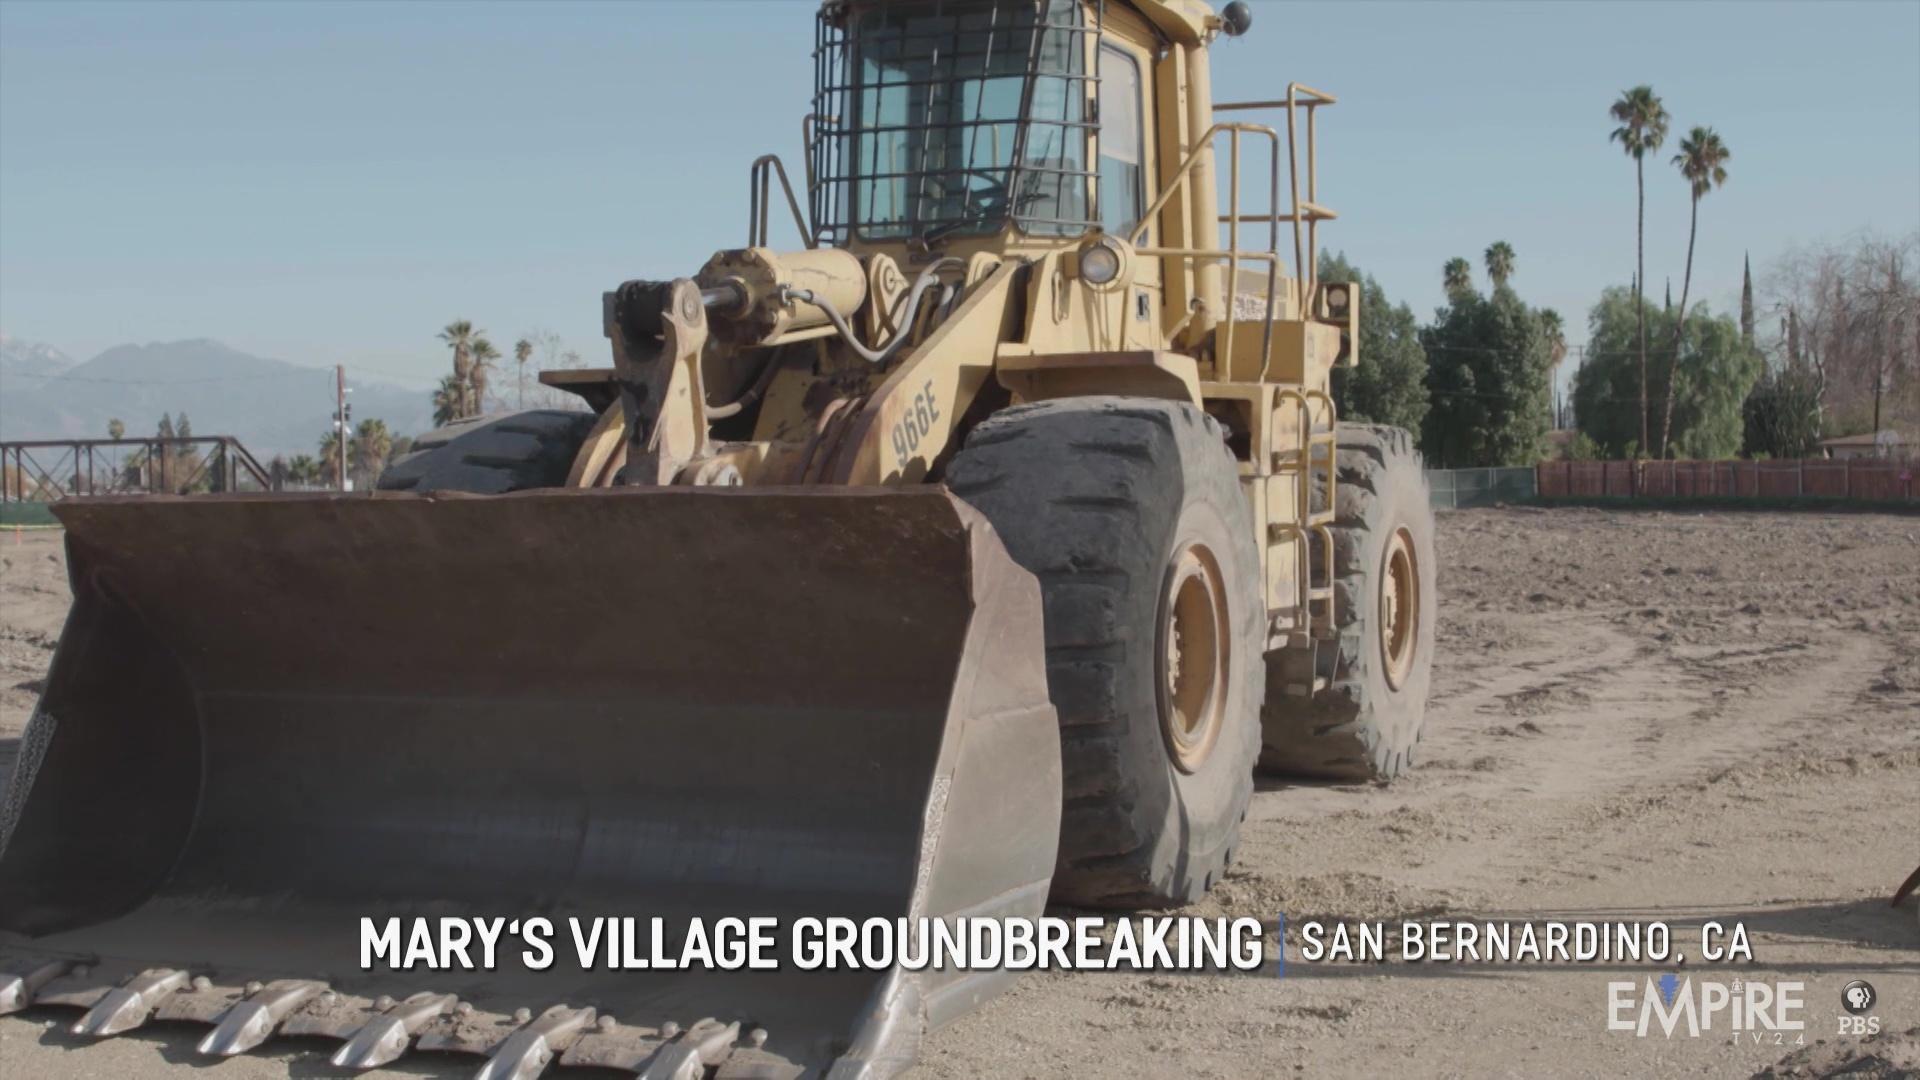 Mary's Village Groundbreaking